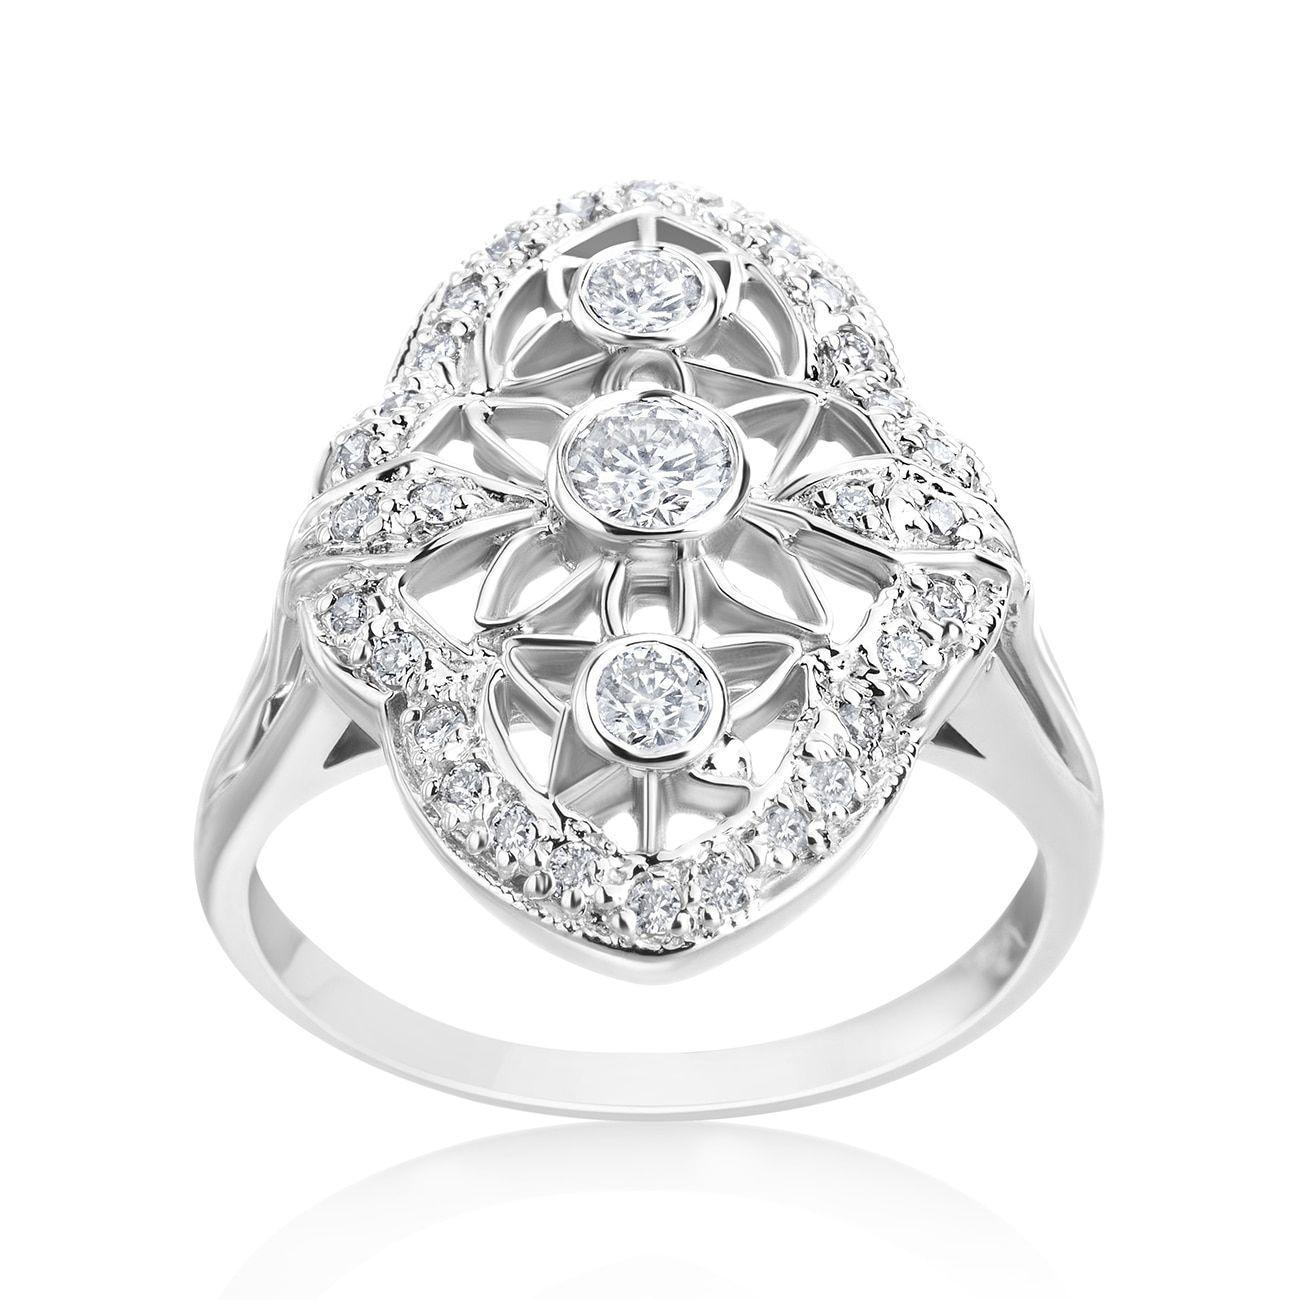 SummerRose 14k White Gold 1/2ct TDW Diamond Vintage Ring ...